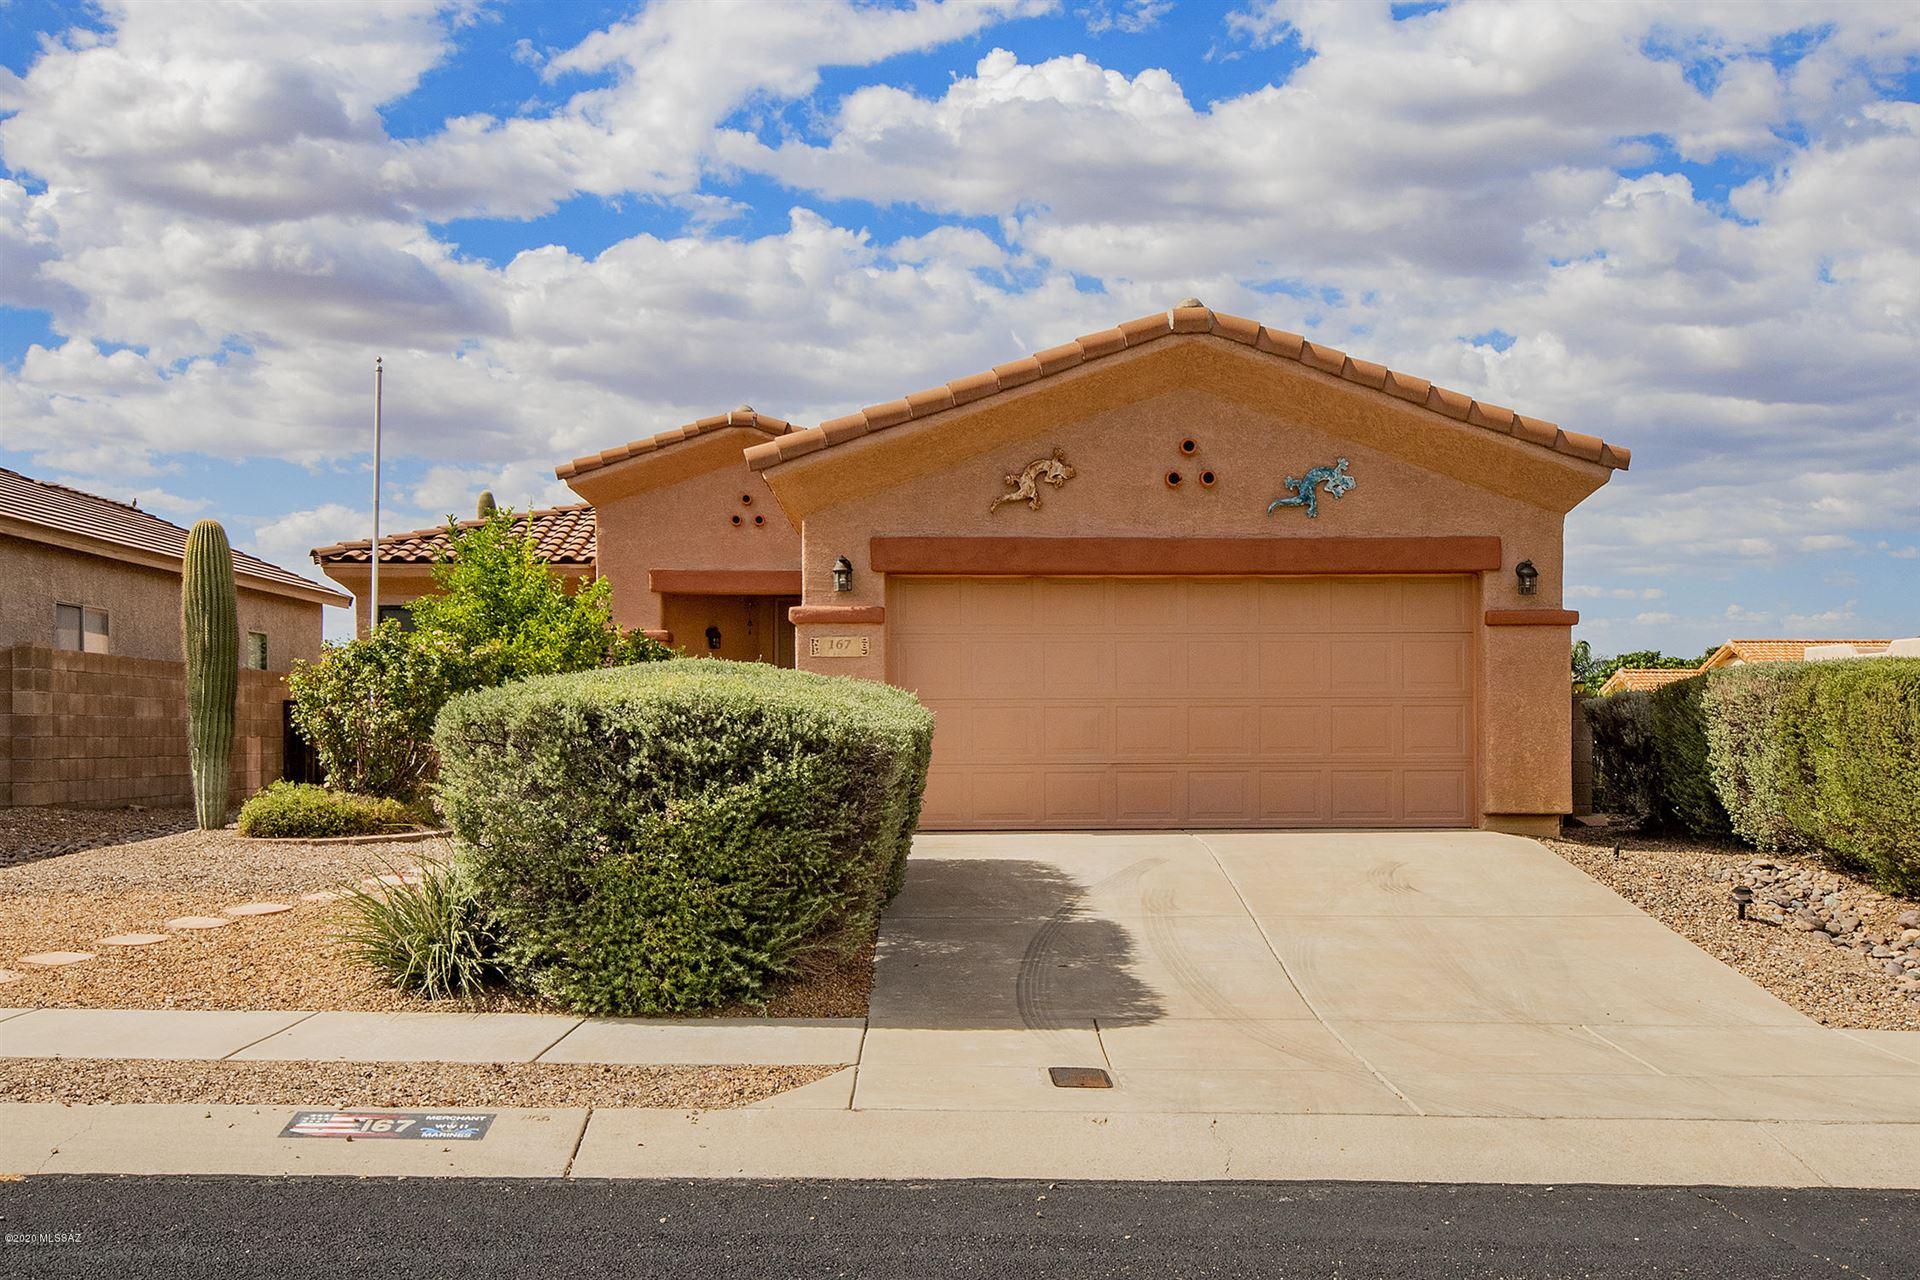 167 E Calle De La Semilla, Green Valley, AZ 85614 - MLS#: 22016274